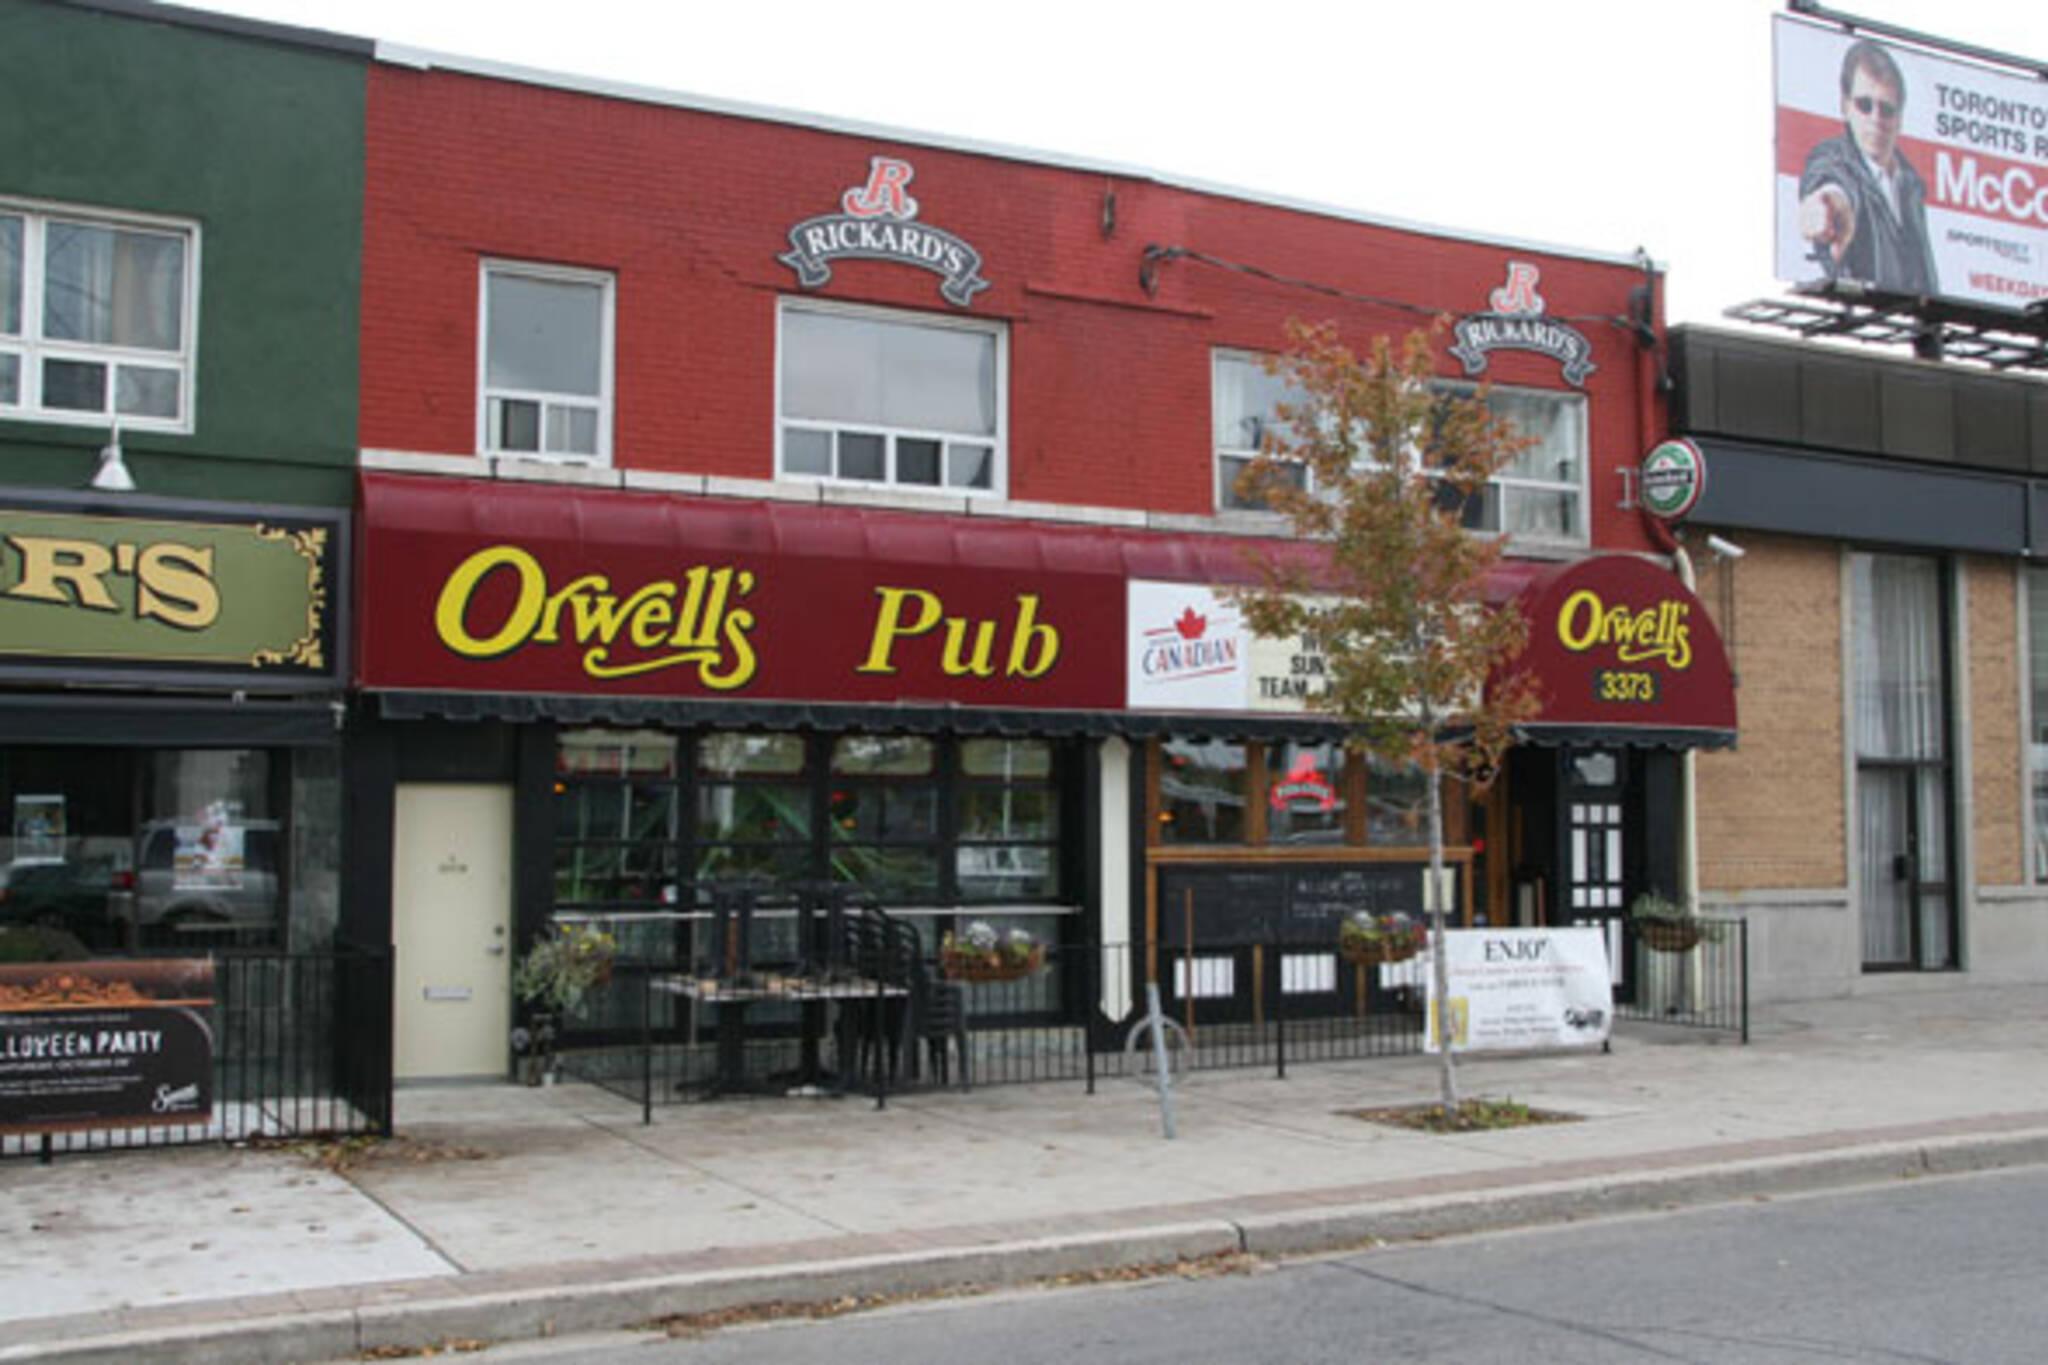 20111022-orwells-pub.jpg